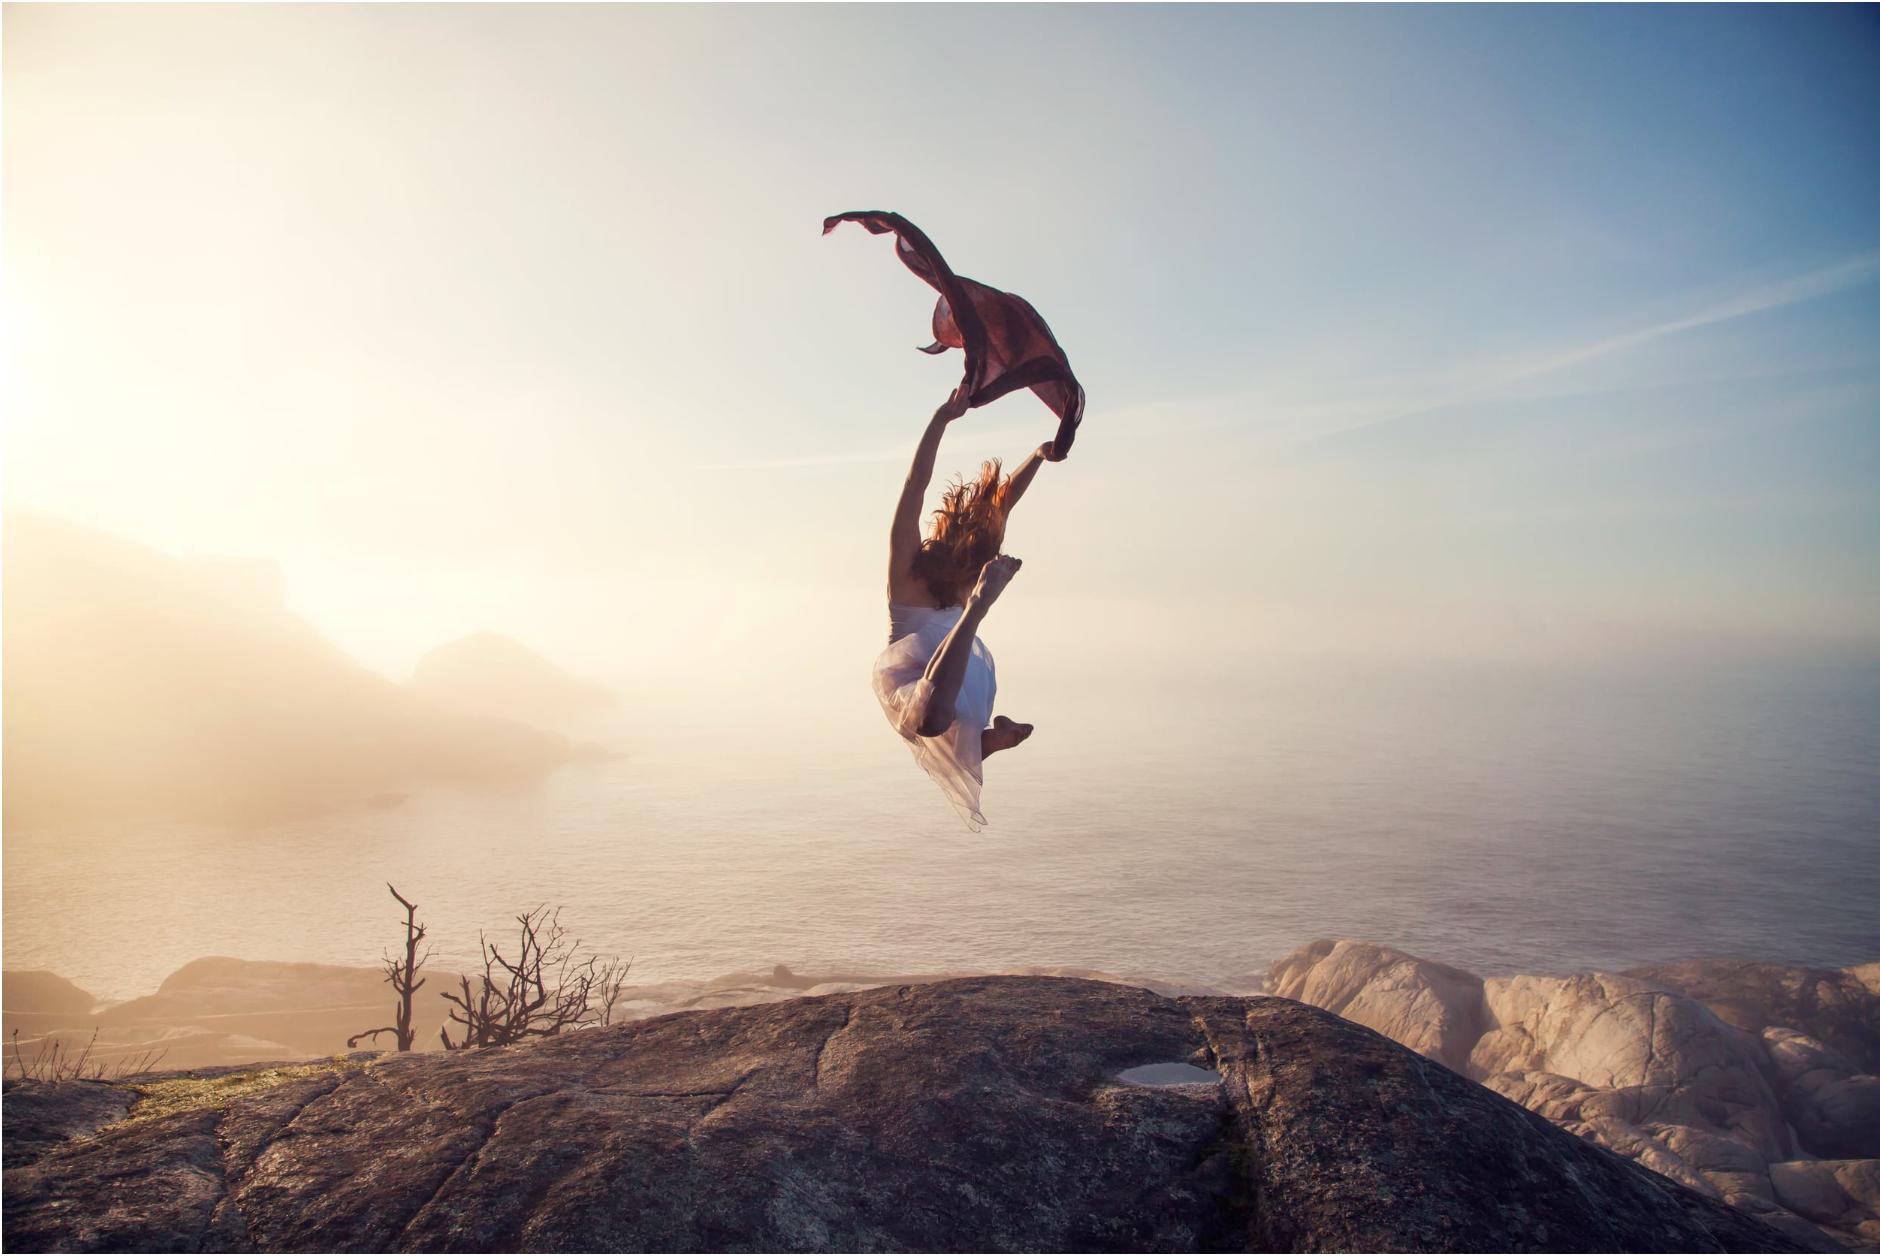 Dancers Series: By Adele Thomas